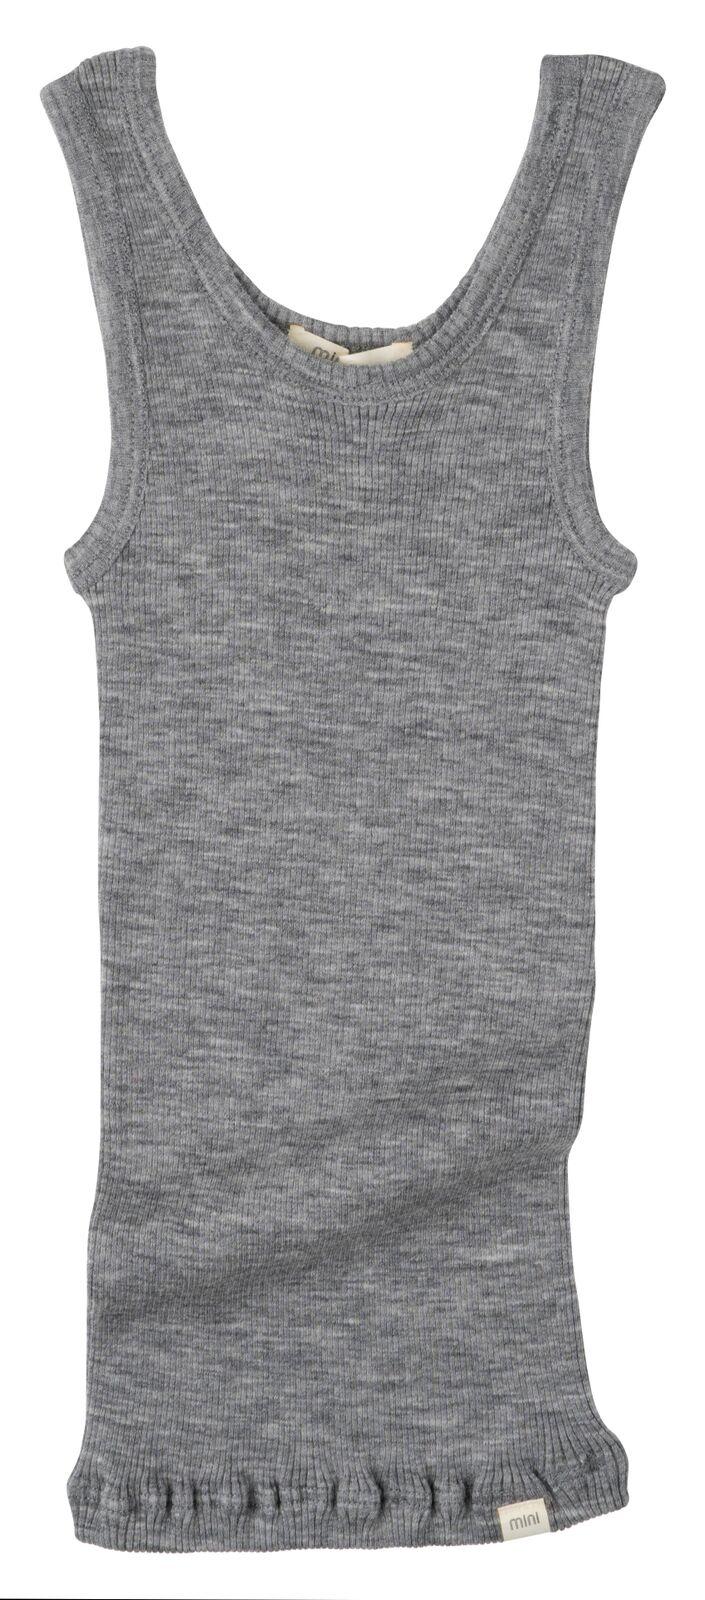 Minimalisma wollen hemd ARENDAL - fijne rib - 100% merino - grijs gemeleerd - 2 tm 12 jaar